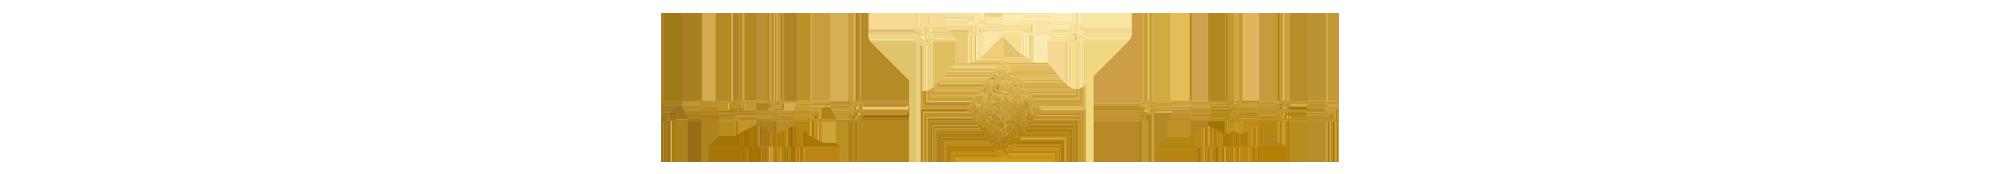 Diamond clipart minimalist. Free printables design gallery